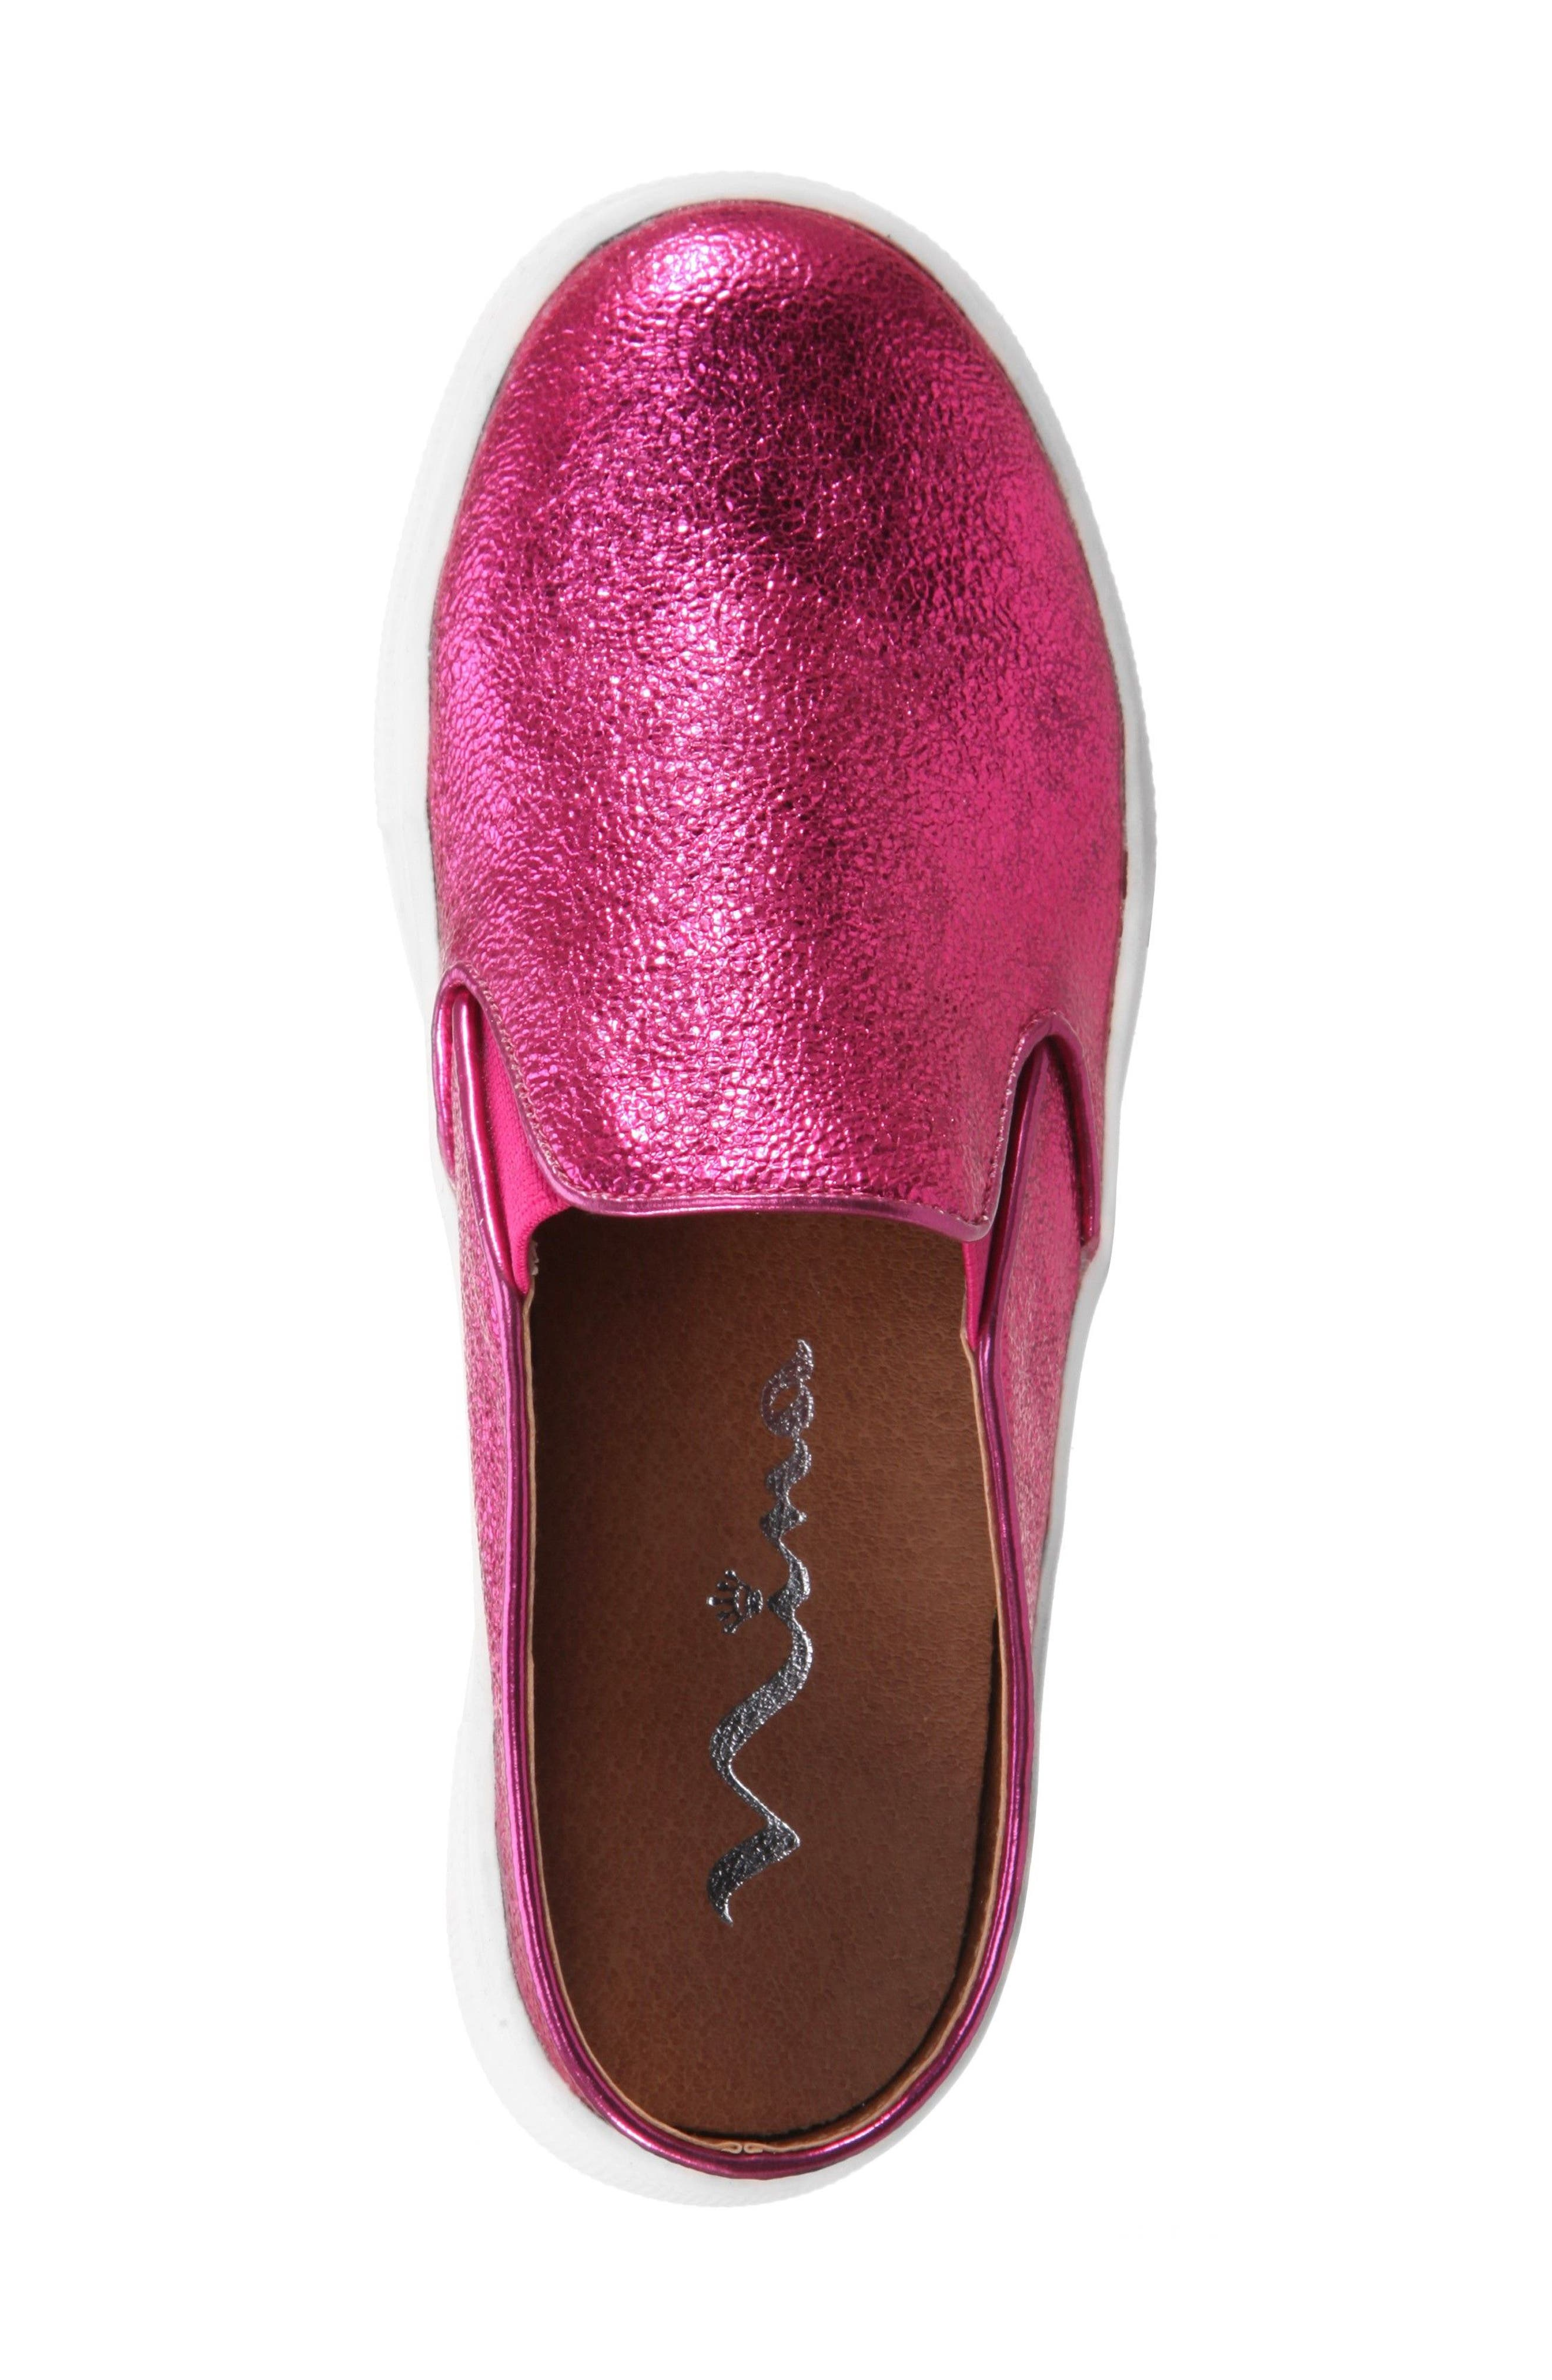 Gail Metallic Slip-On Sneaker Mule,                             Alternate thumbnail 15, color,